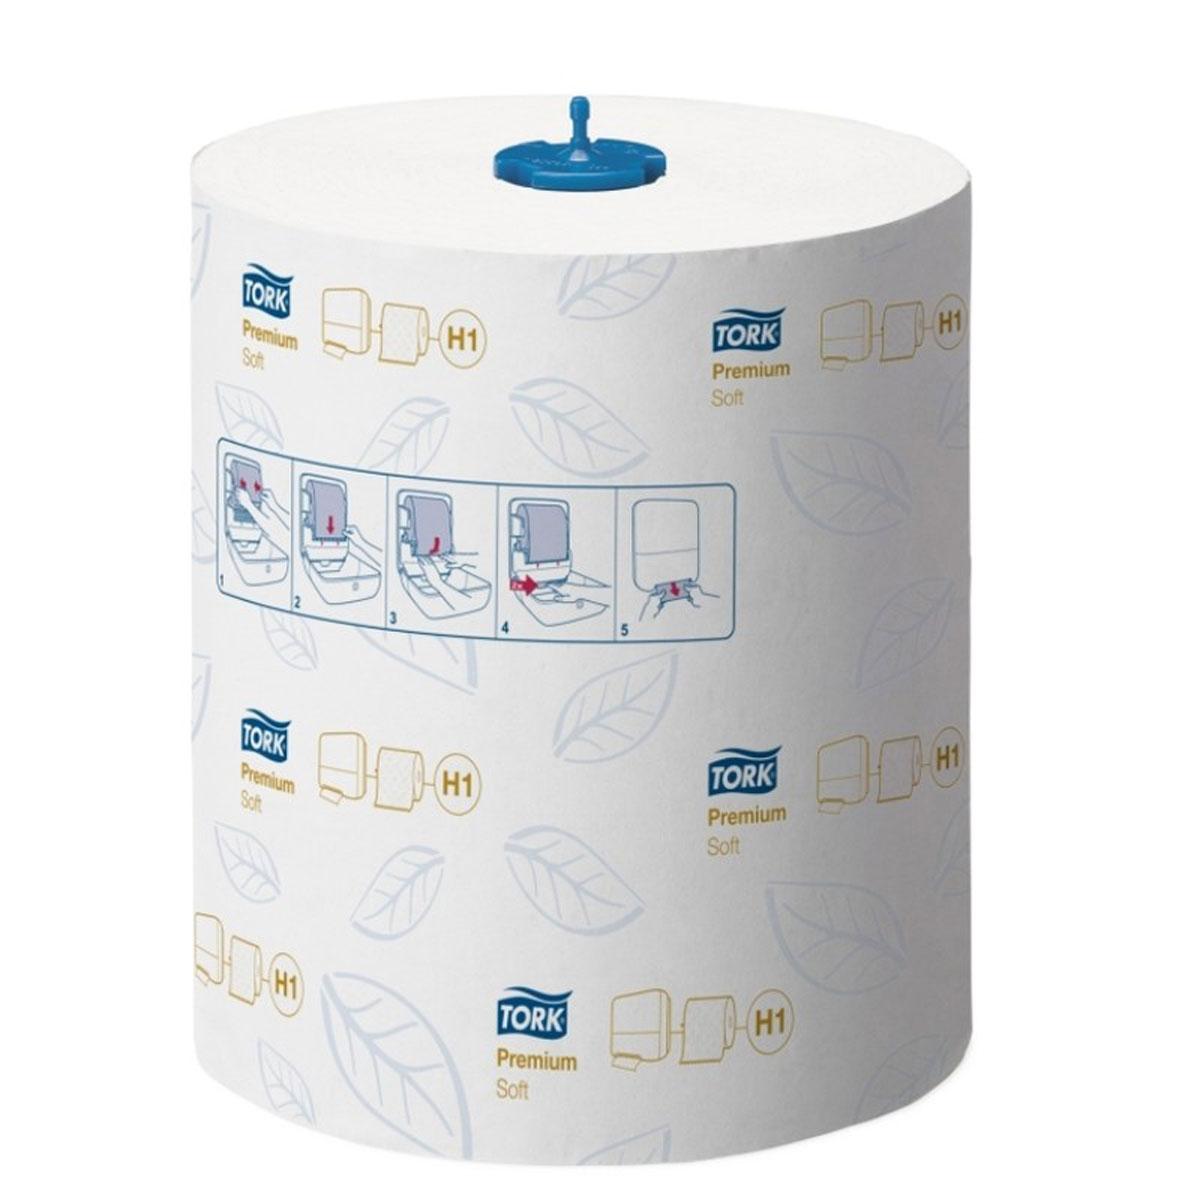 Tork Matic полотенца в рулонах мягкие 2-сл 100м, коробка 6 шт290016Целлюлоза